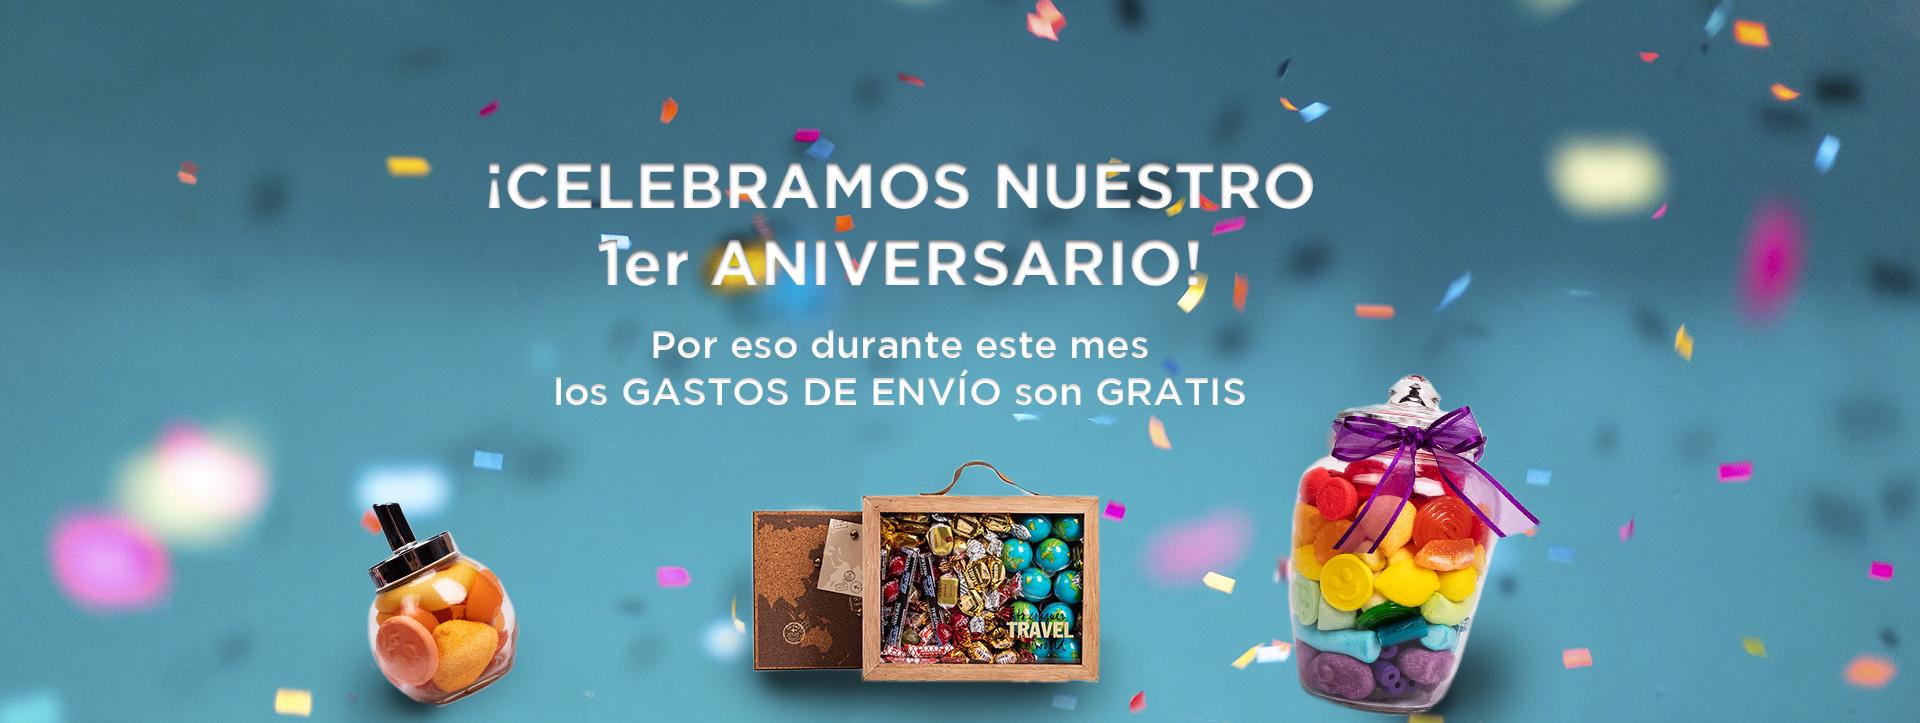 banner aniversario (2)